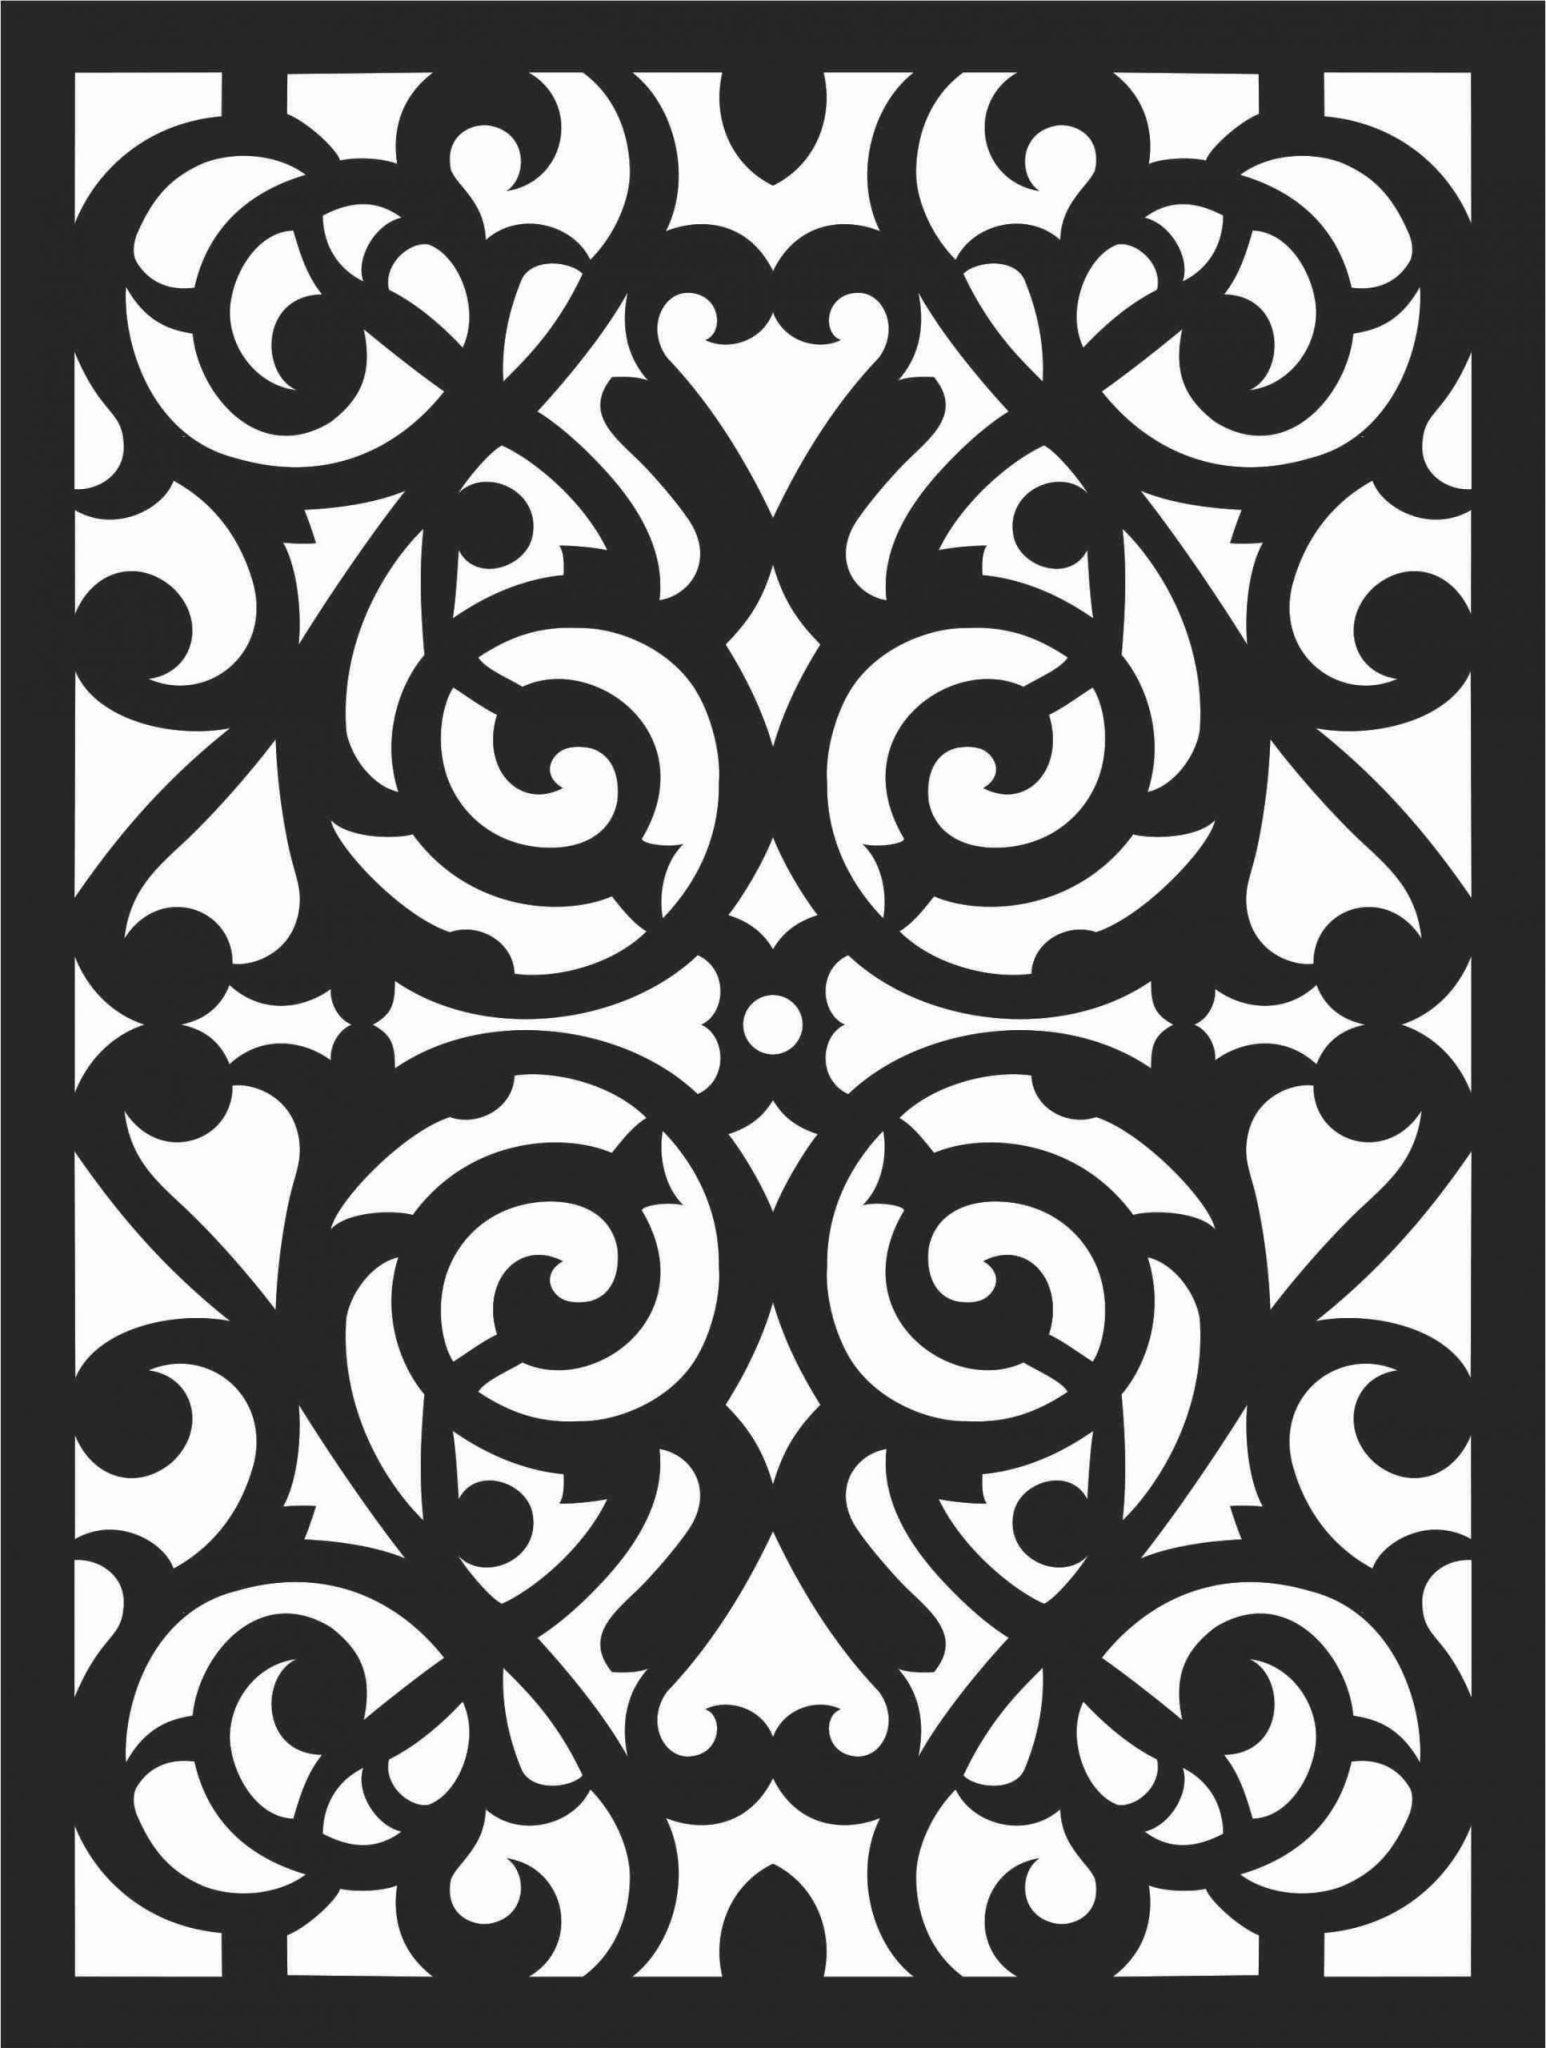 Screen Panel Patterns Seamless 67 Free DXF File